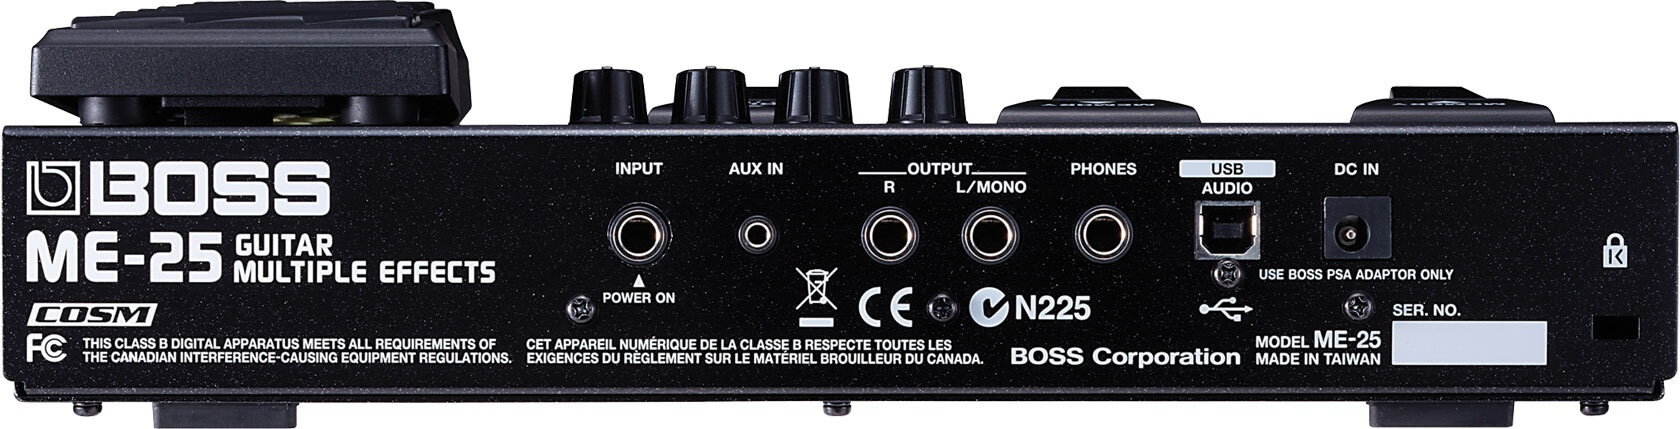 Boss ME25 Multi-effects Guitar Pedal